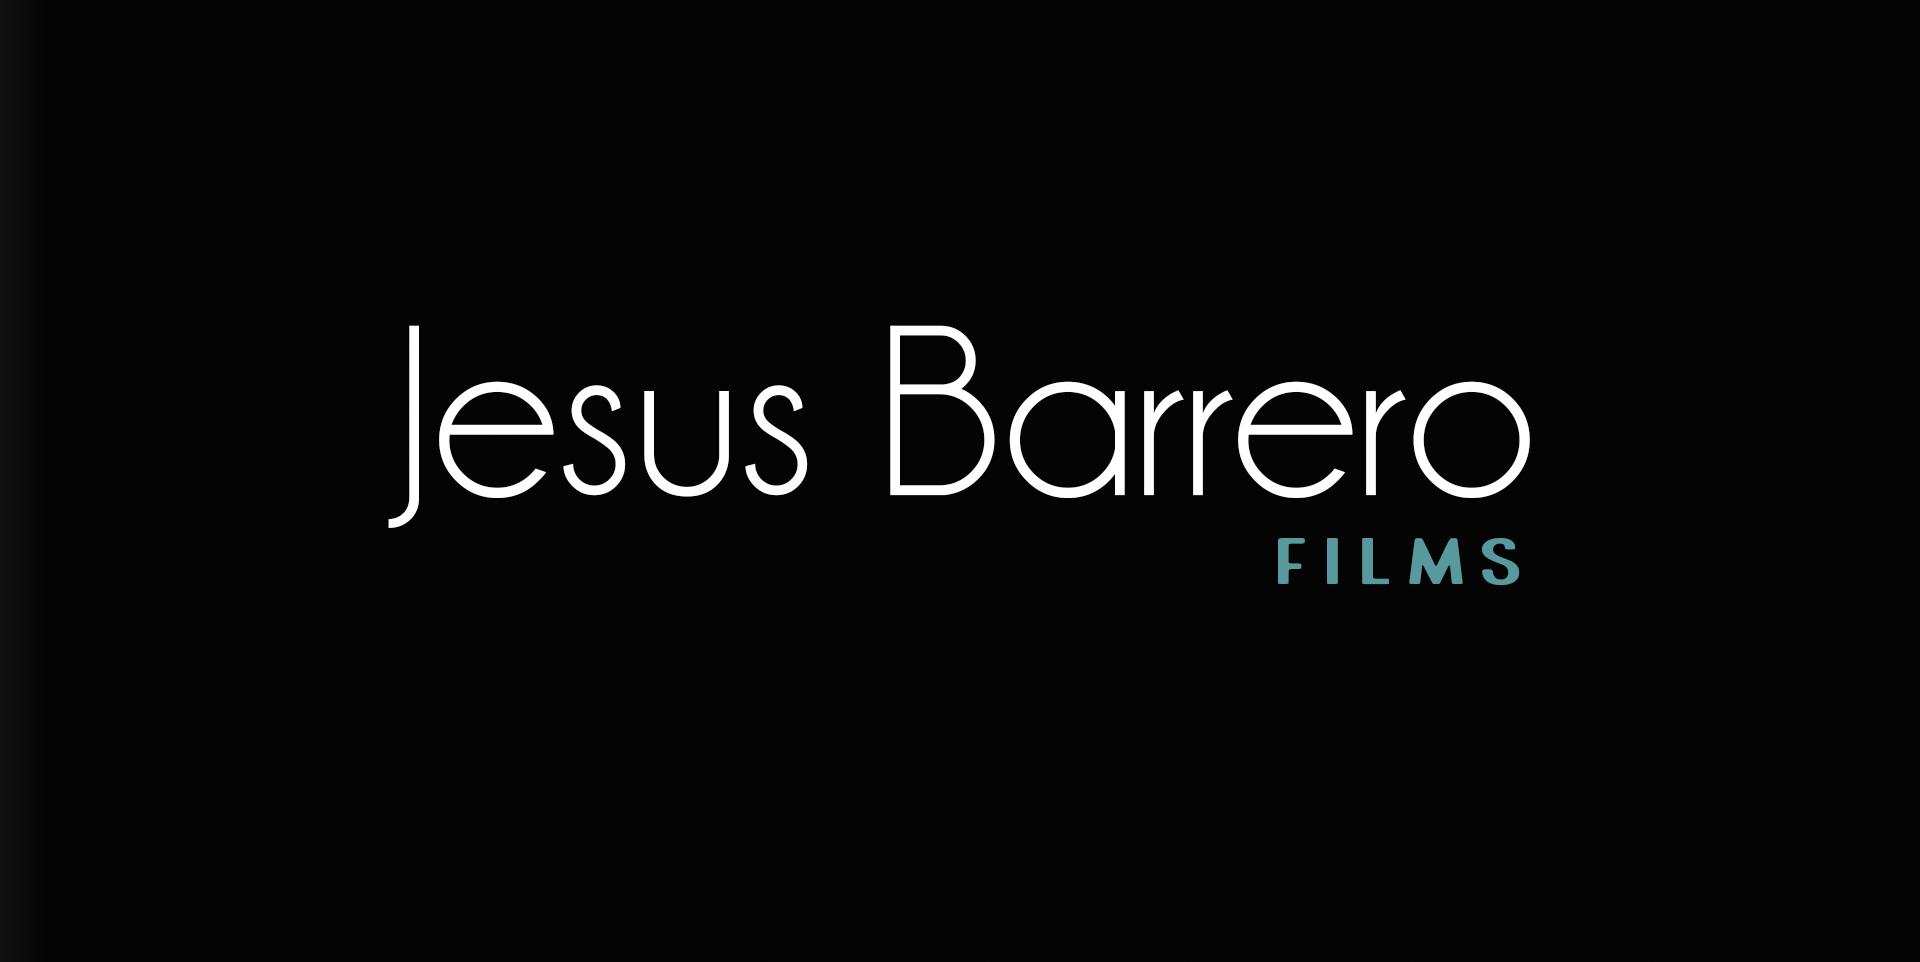 Jesus Barrero films